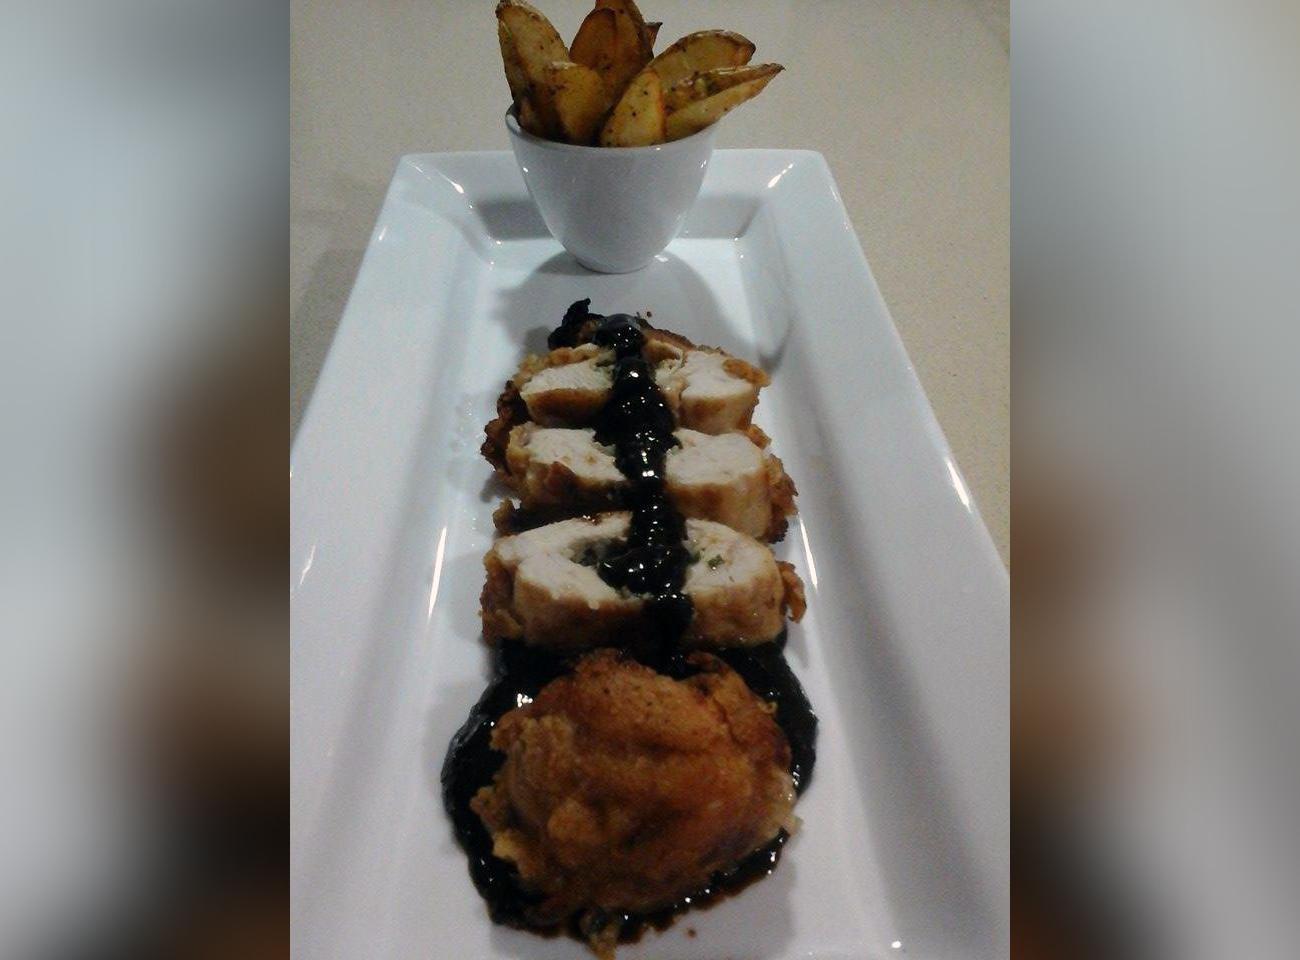 Walnut chicken kiev with chocolate bbq sauce served with potato wedges by Roberta Montfort